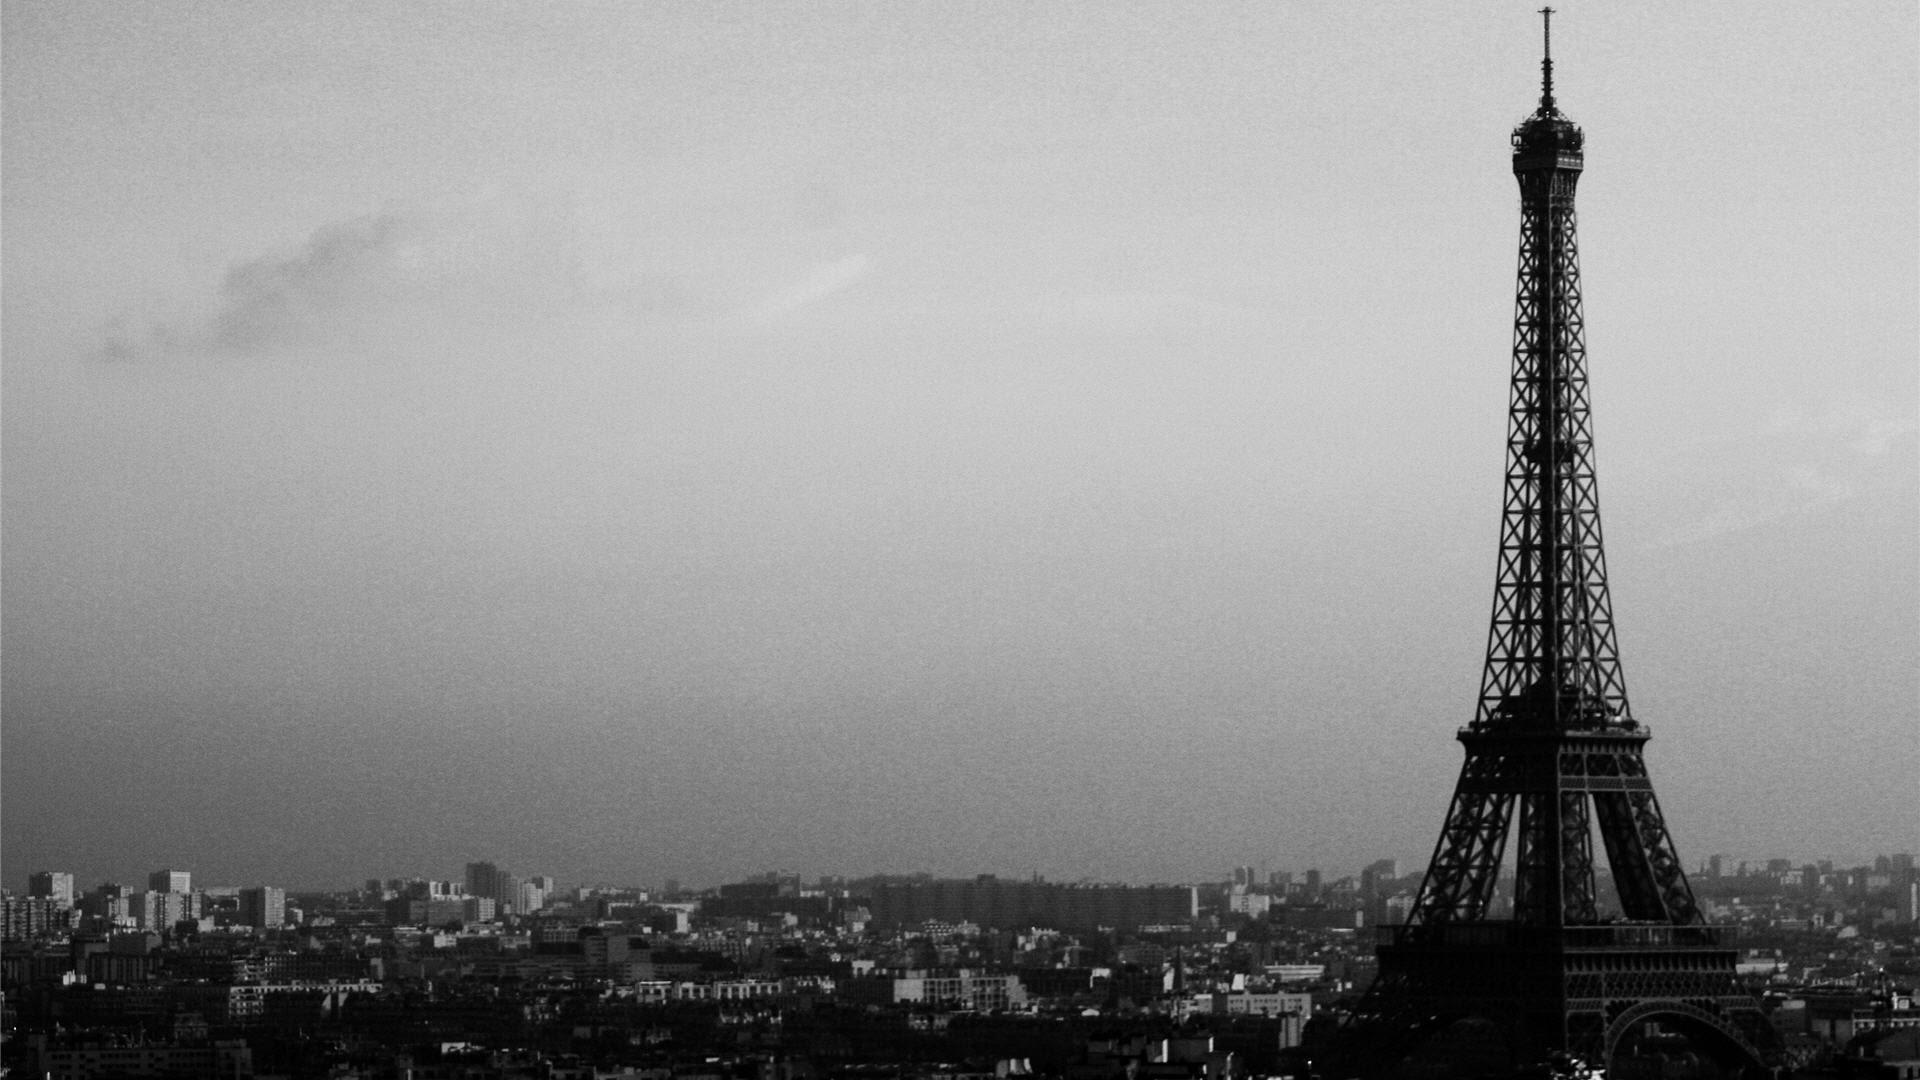 Black And White Paris Wallpaper 57 Images